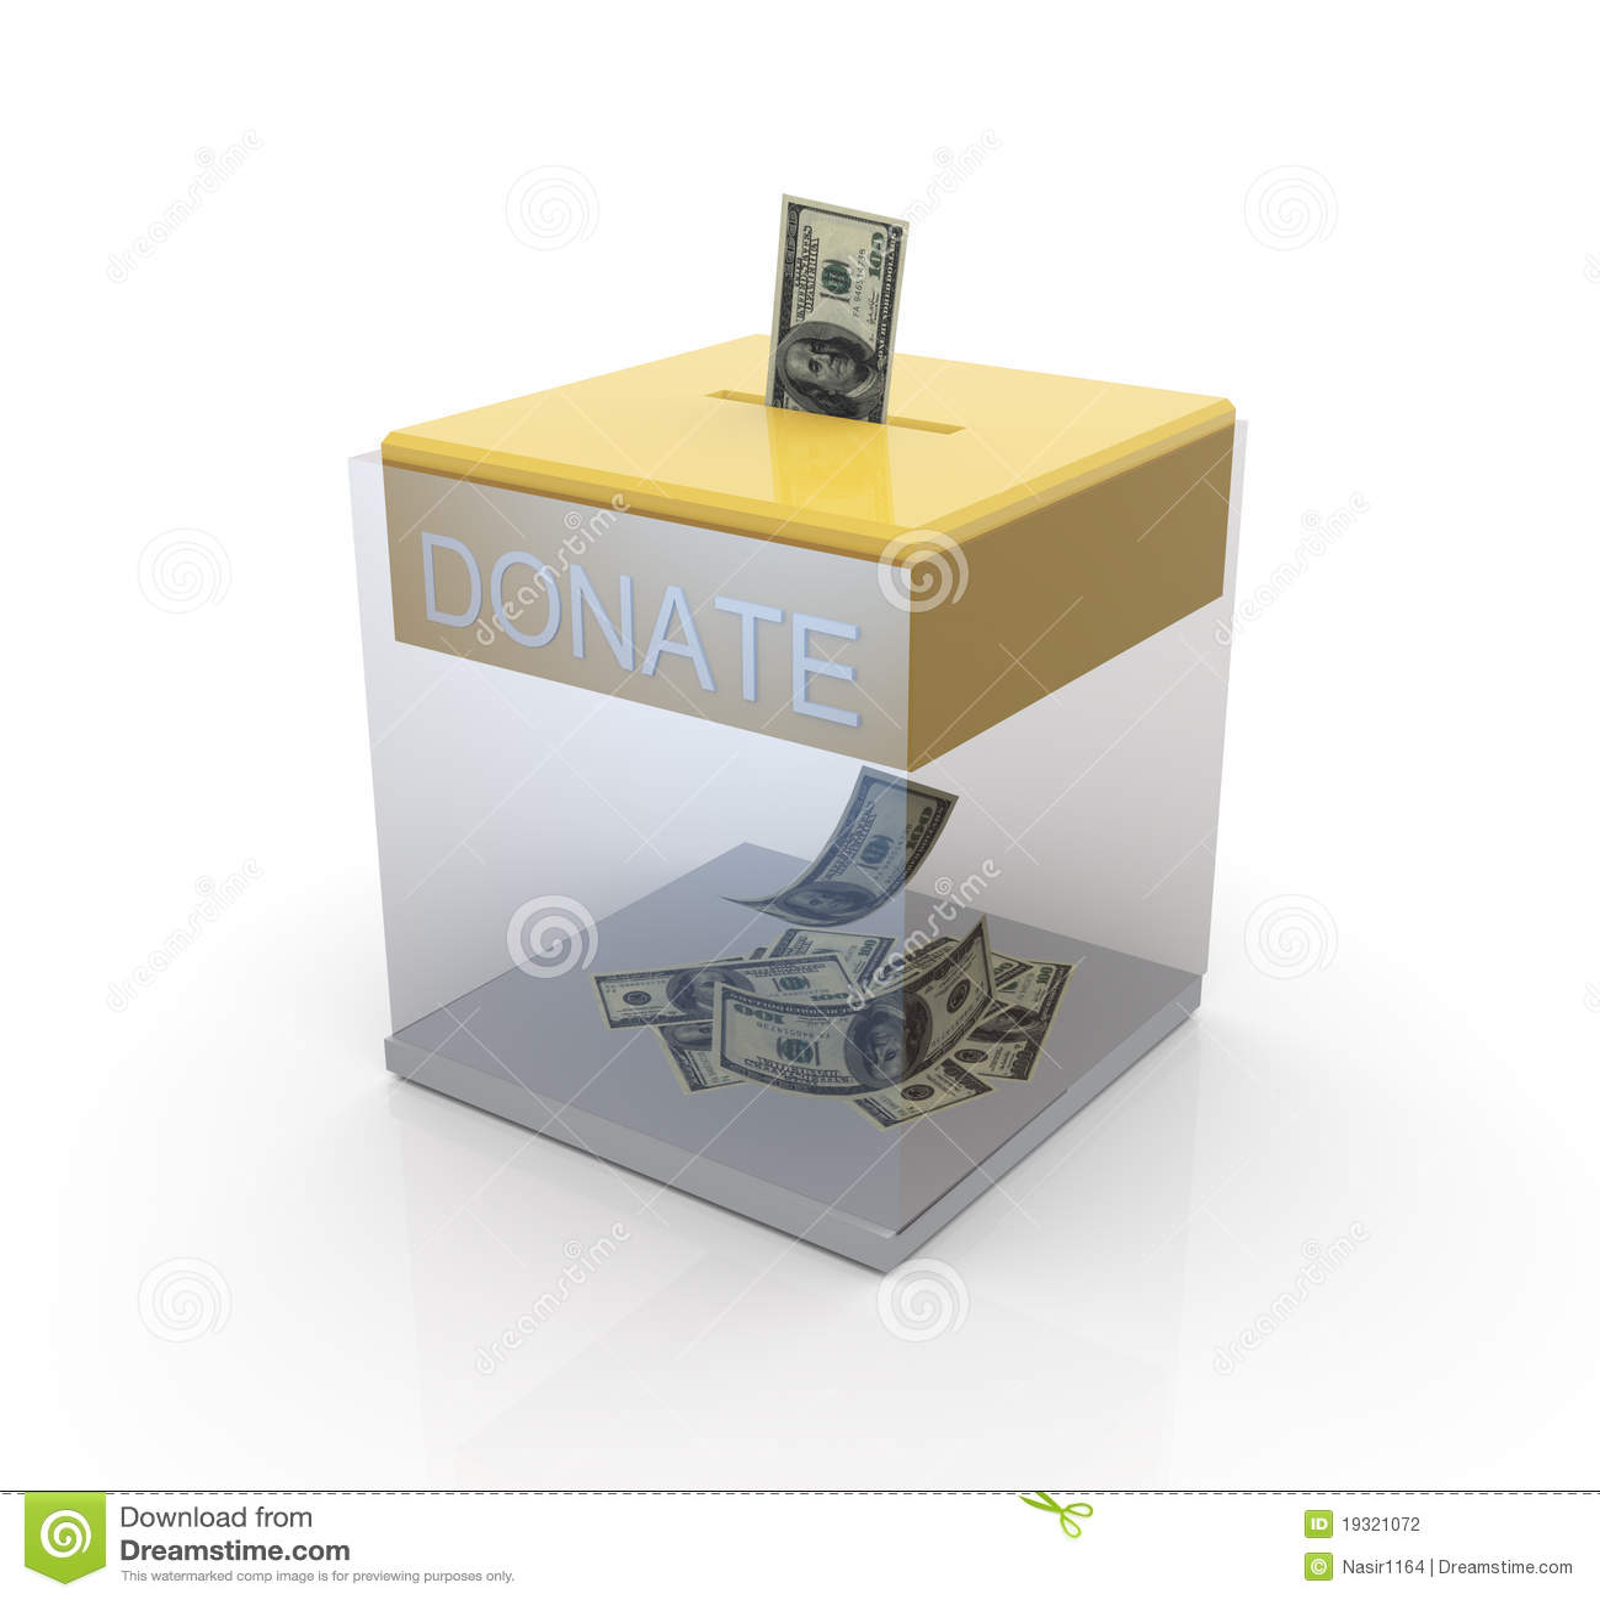 Transparent donation box stock illustration. Image of ...